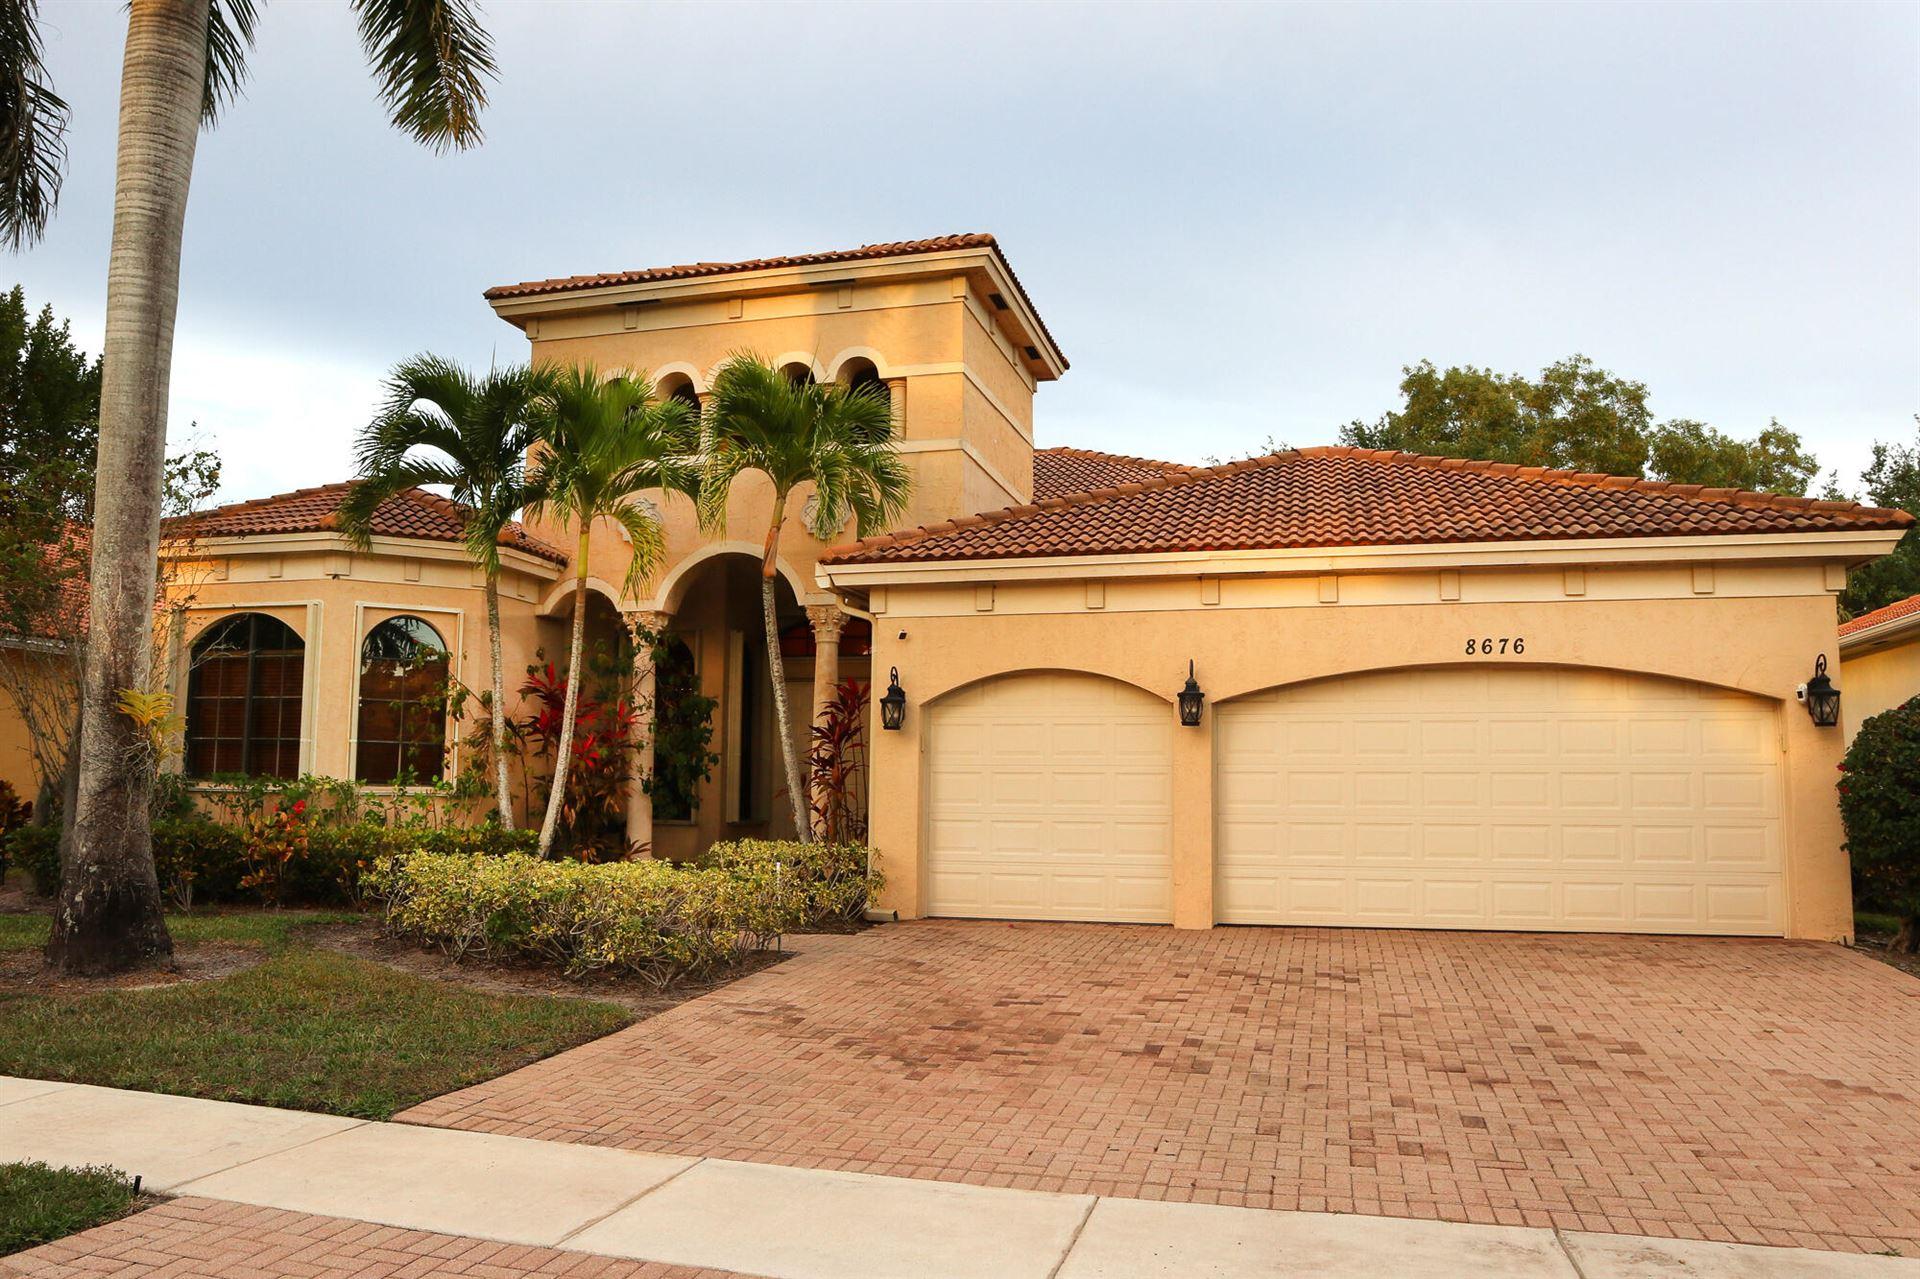 8676 Club Estates Way, Lake Worth, FL 33467 - MLS#: RX-10704857